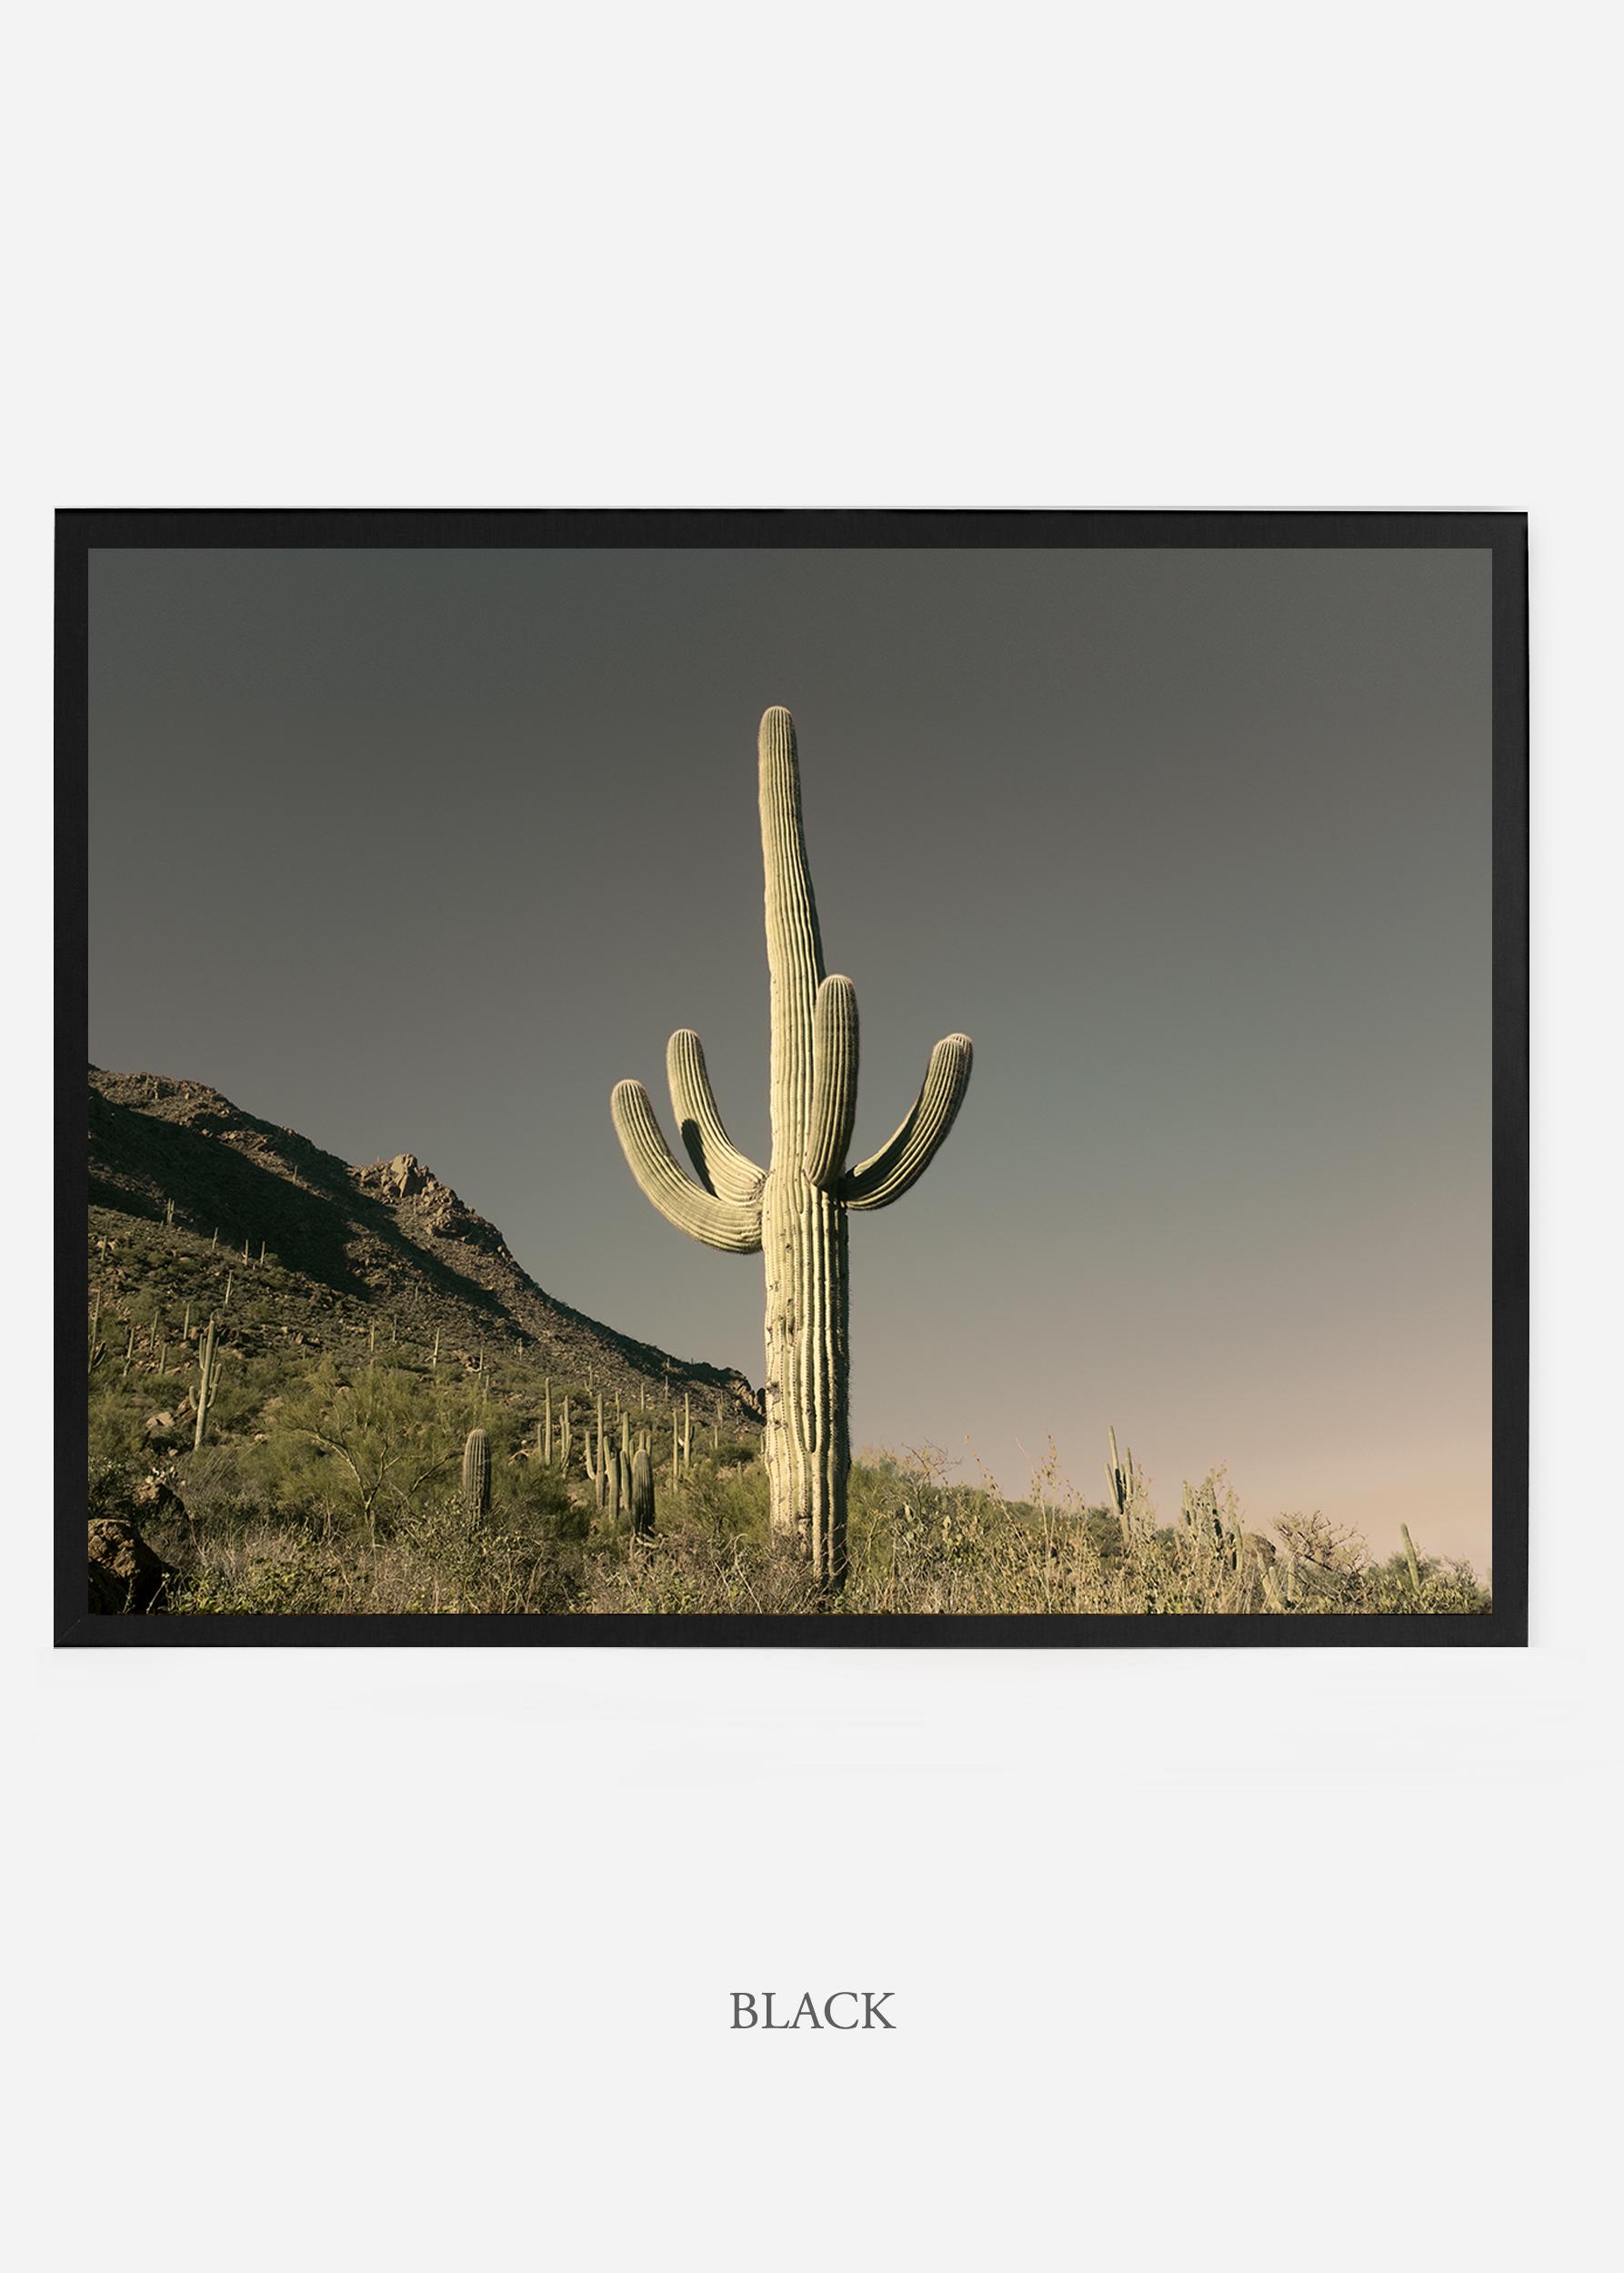 nomat_blackframe-saguaroNo.19-wildercalifornia-art-wallart-cactusprint-homedecor-prints-arizona-botanical-artwork-interiordesign.jpg